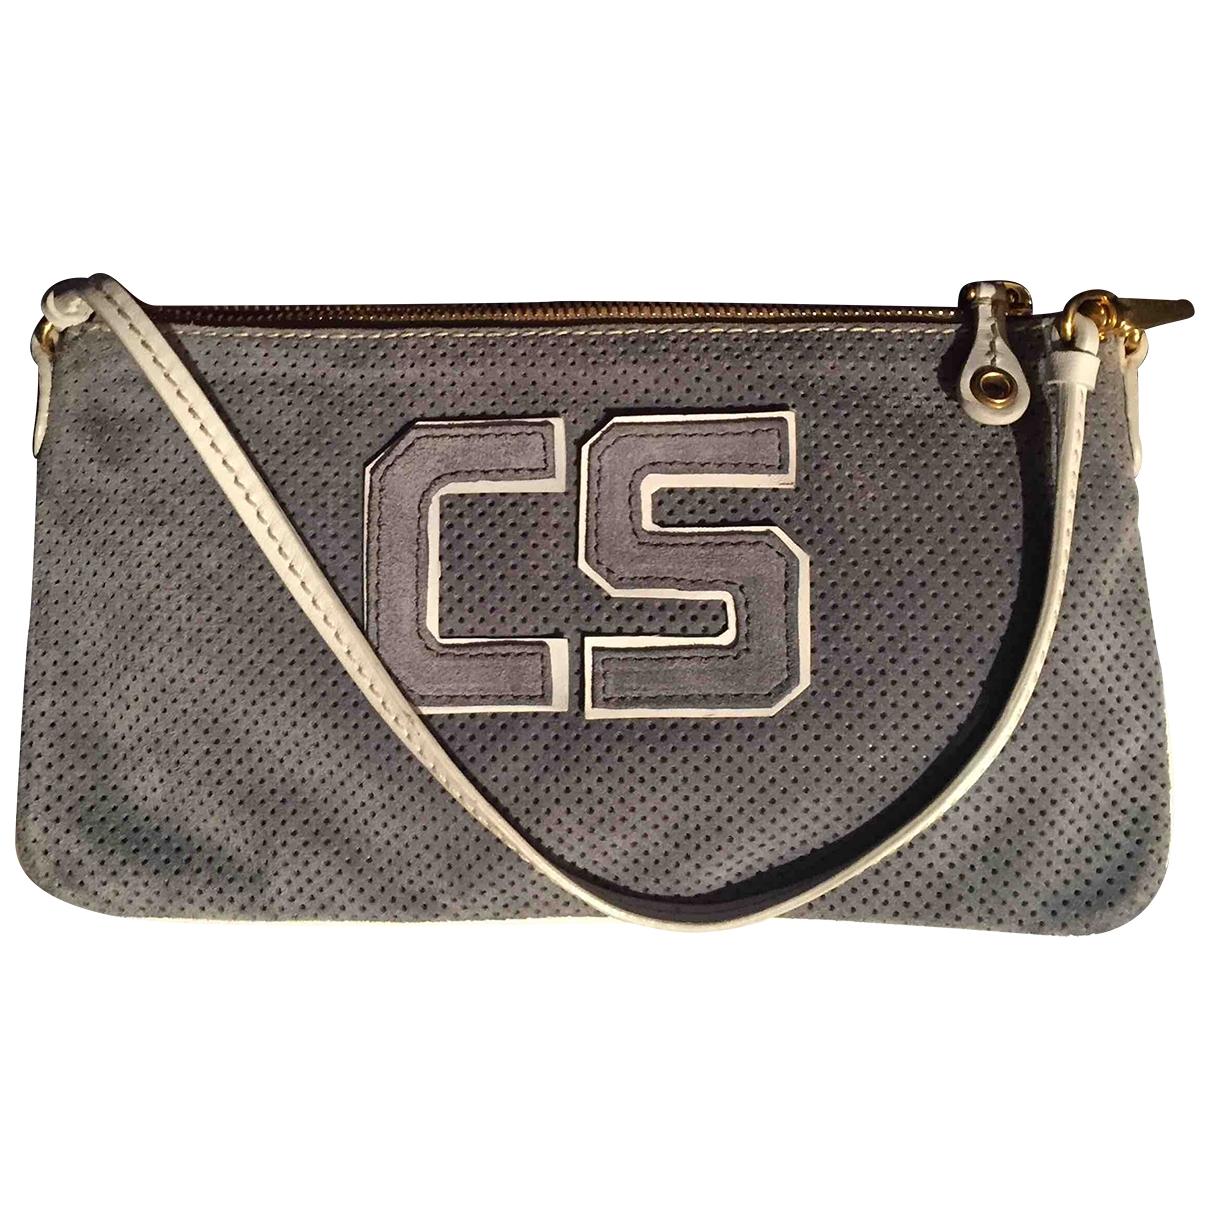 Carshoe \N Handtasche in Veloursleder